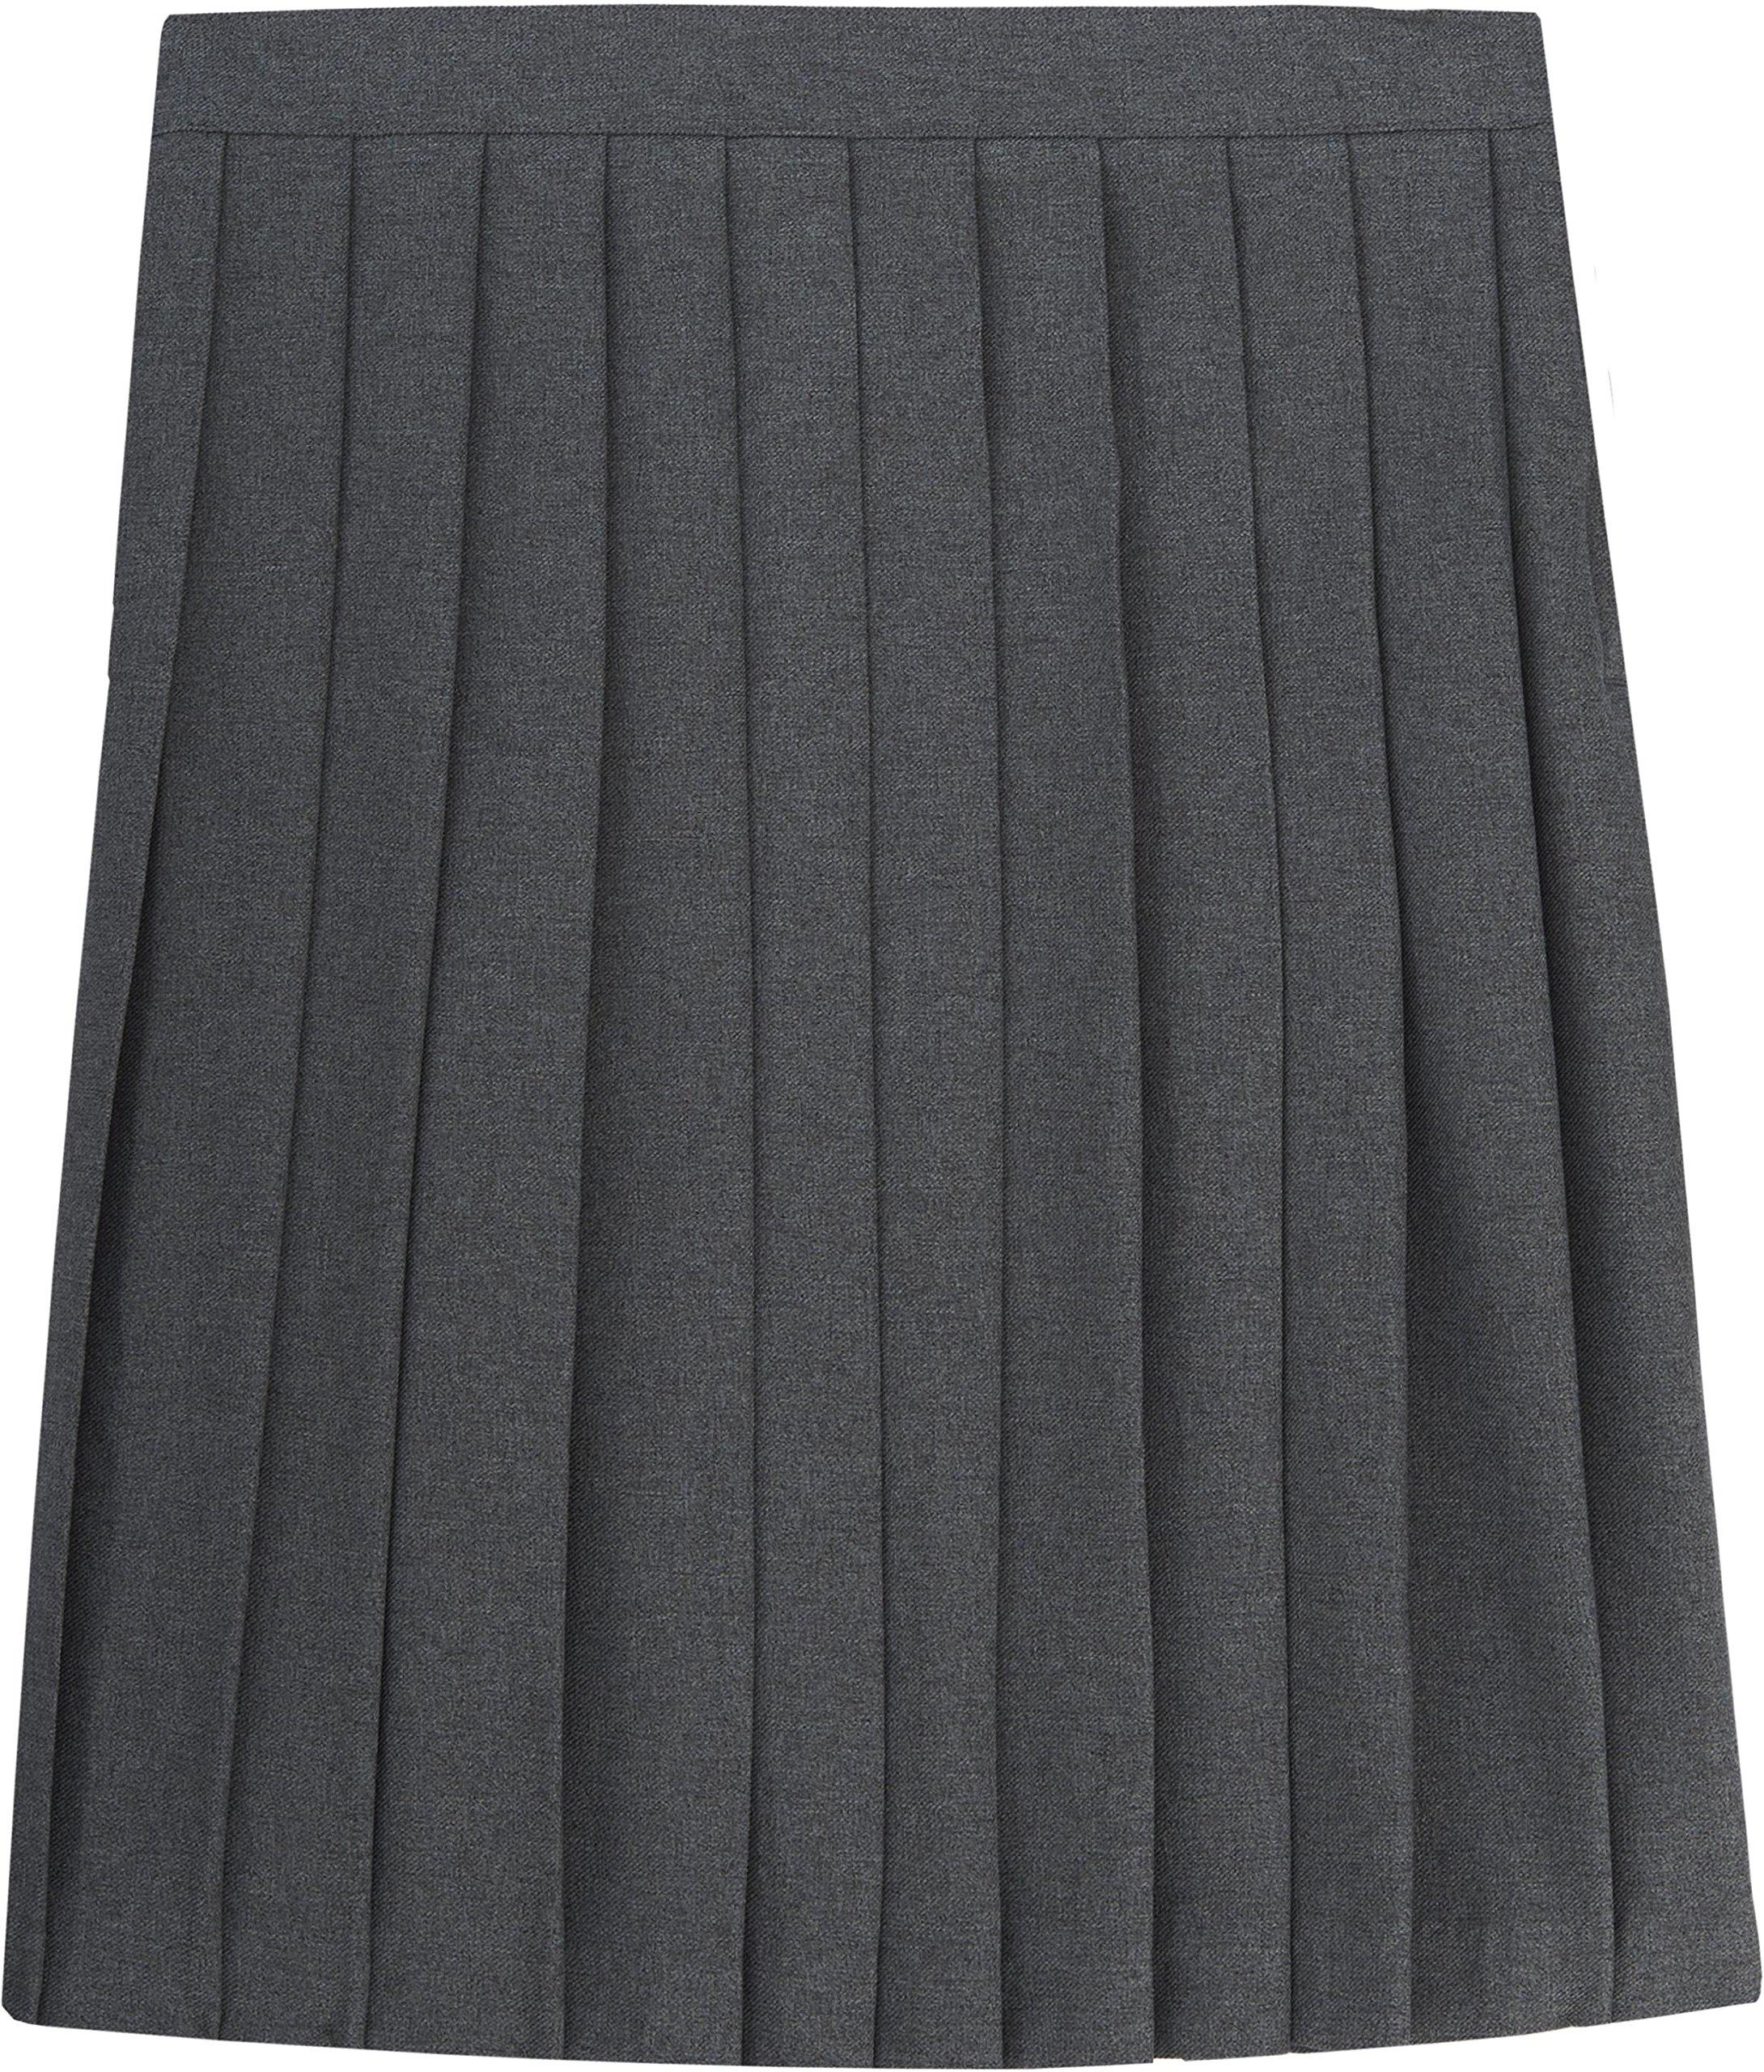 French Toast School Uniform Girls Pleated Skirt, Gray, 12